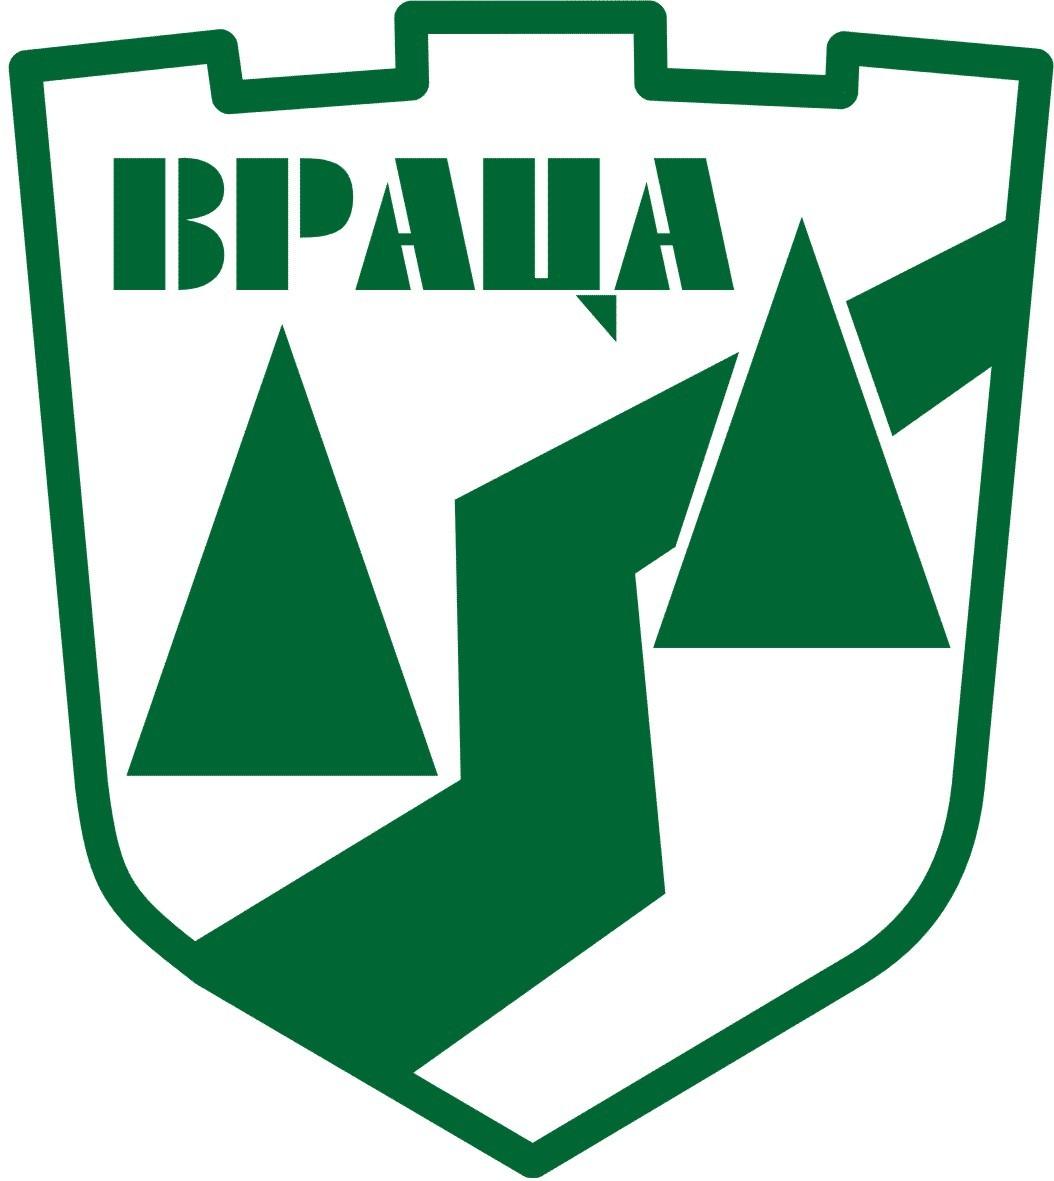 Община Враца - logo